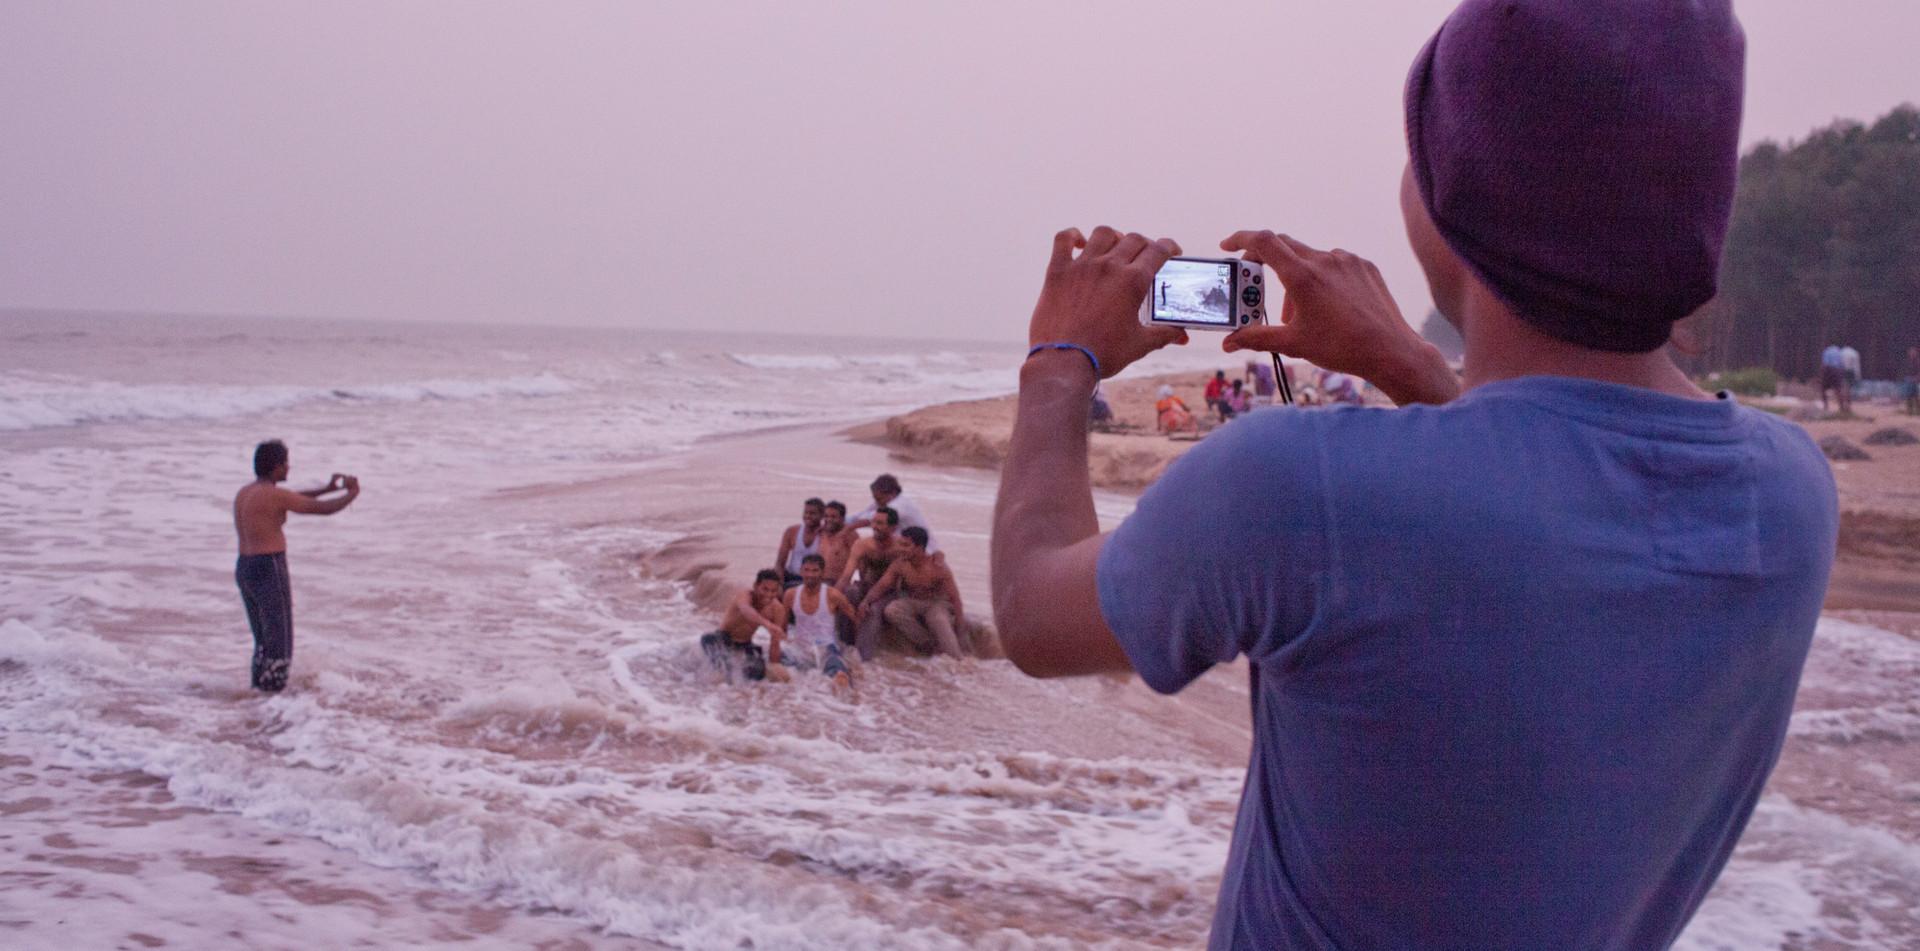 Transgender photovoice shoot in India